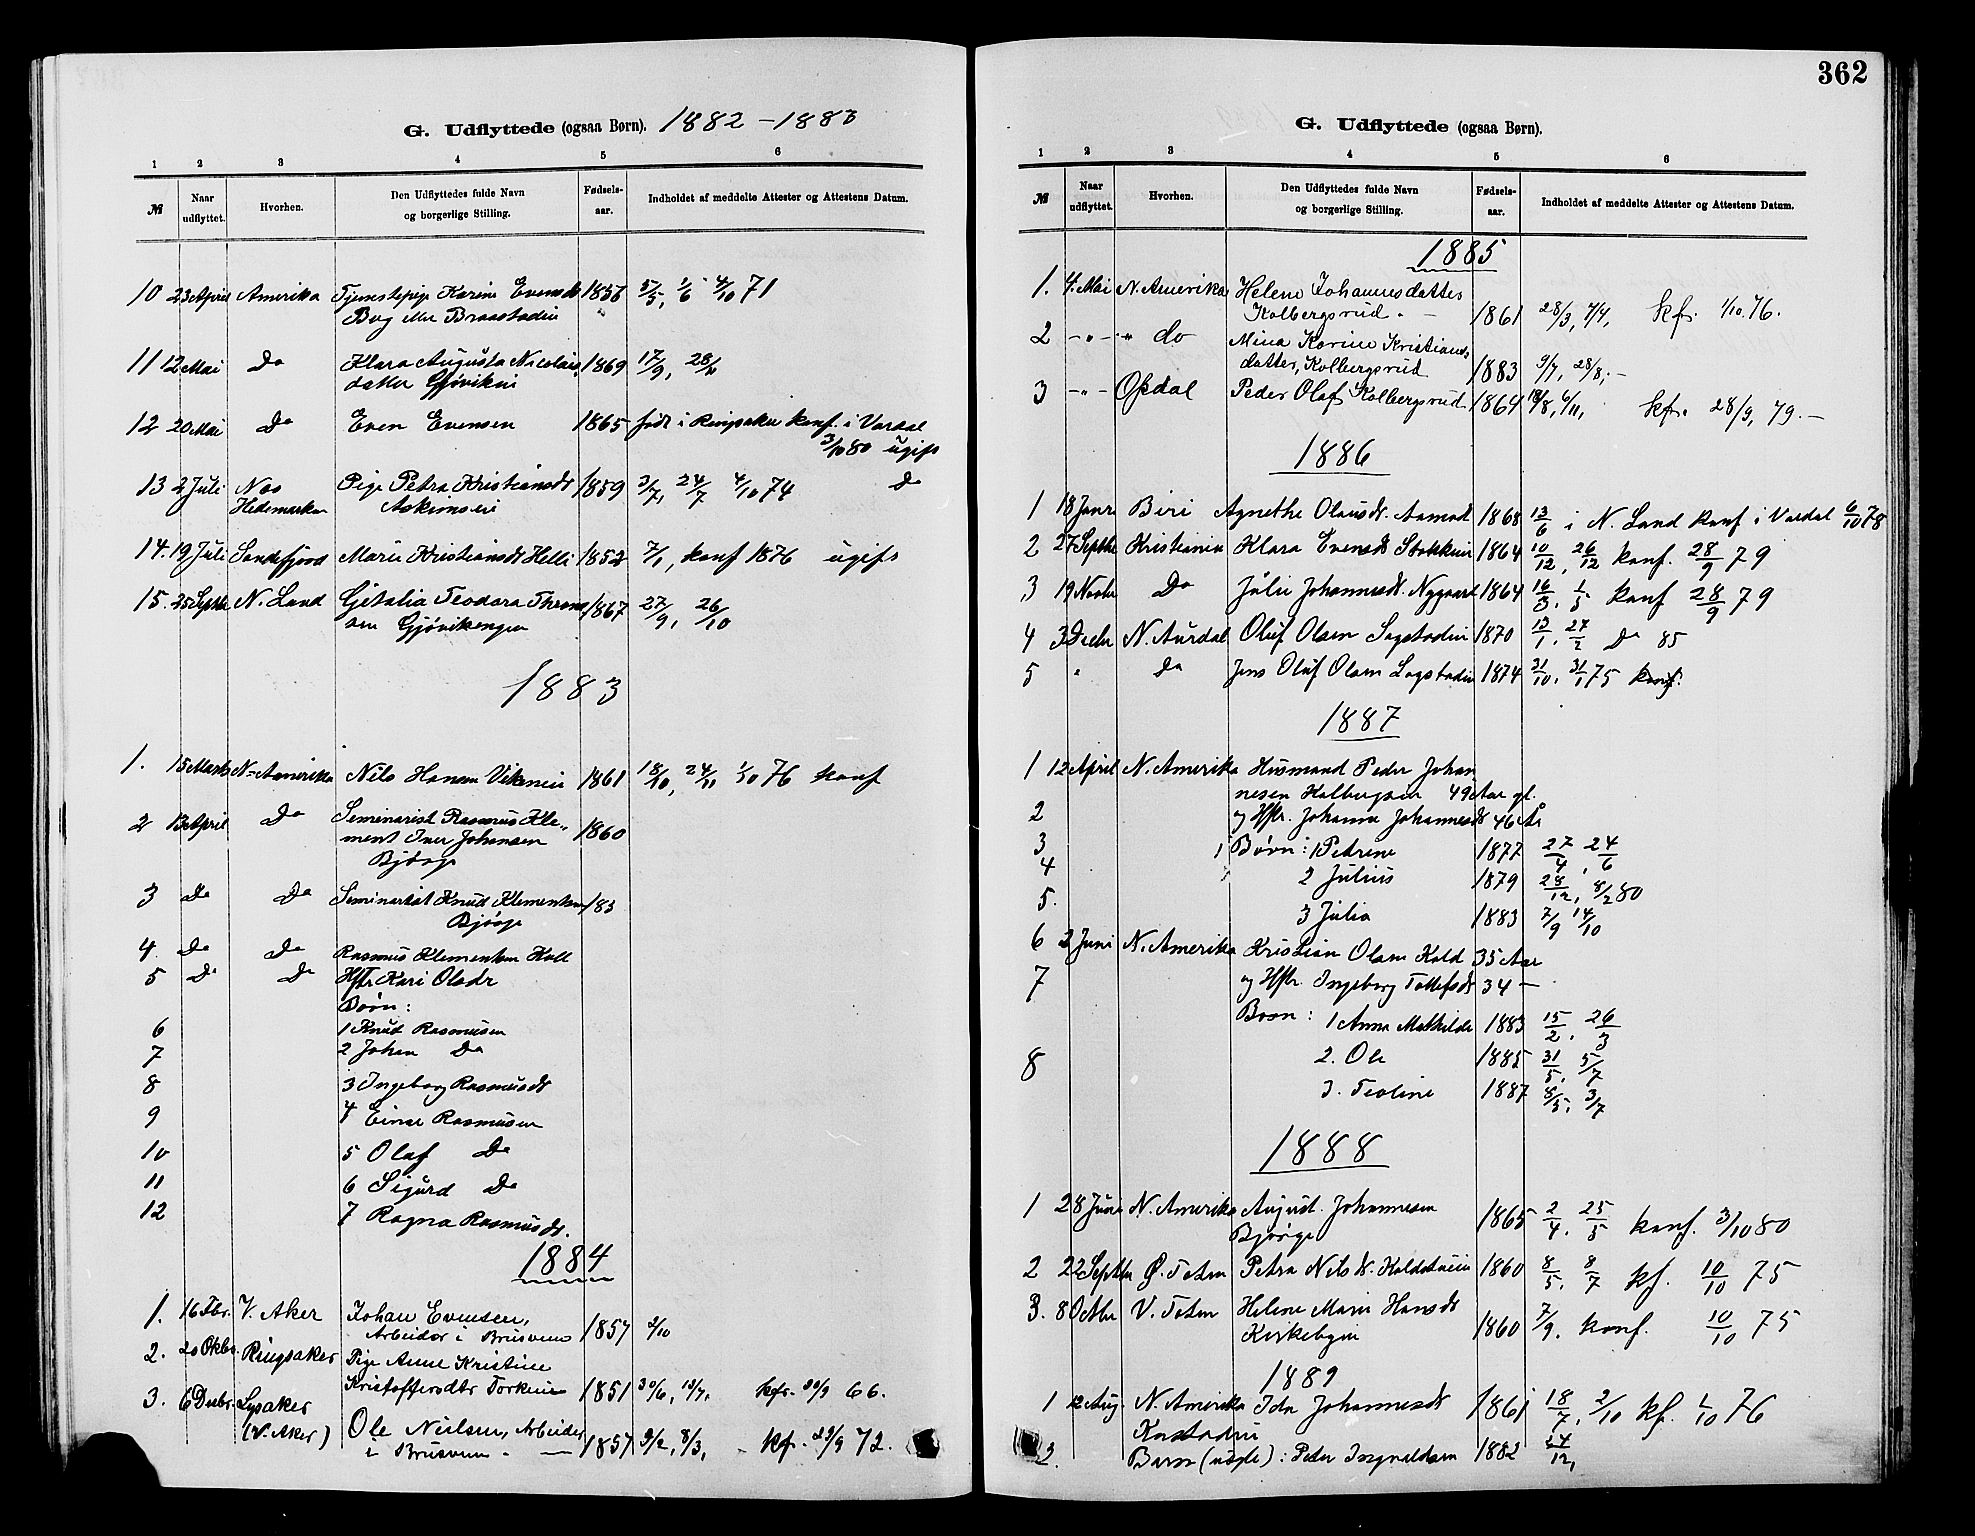 SAH, Vardal prestekontor, H/Ha/Hab/L0007: Klokkerbok nr. 7 /1, 1881-1895, s. 362